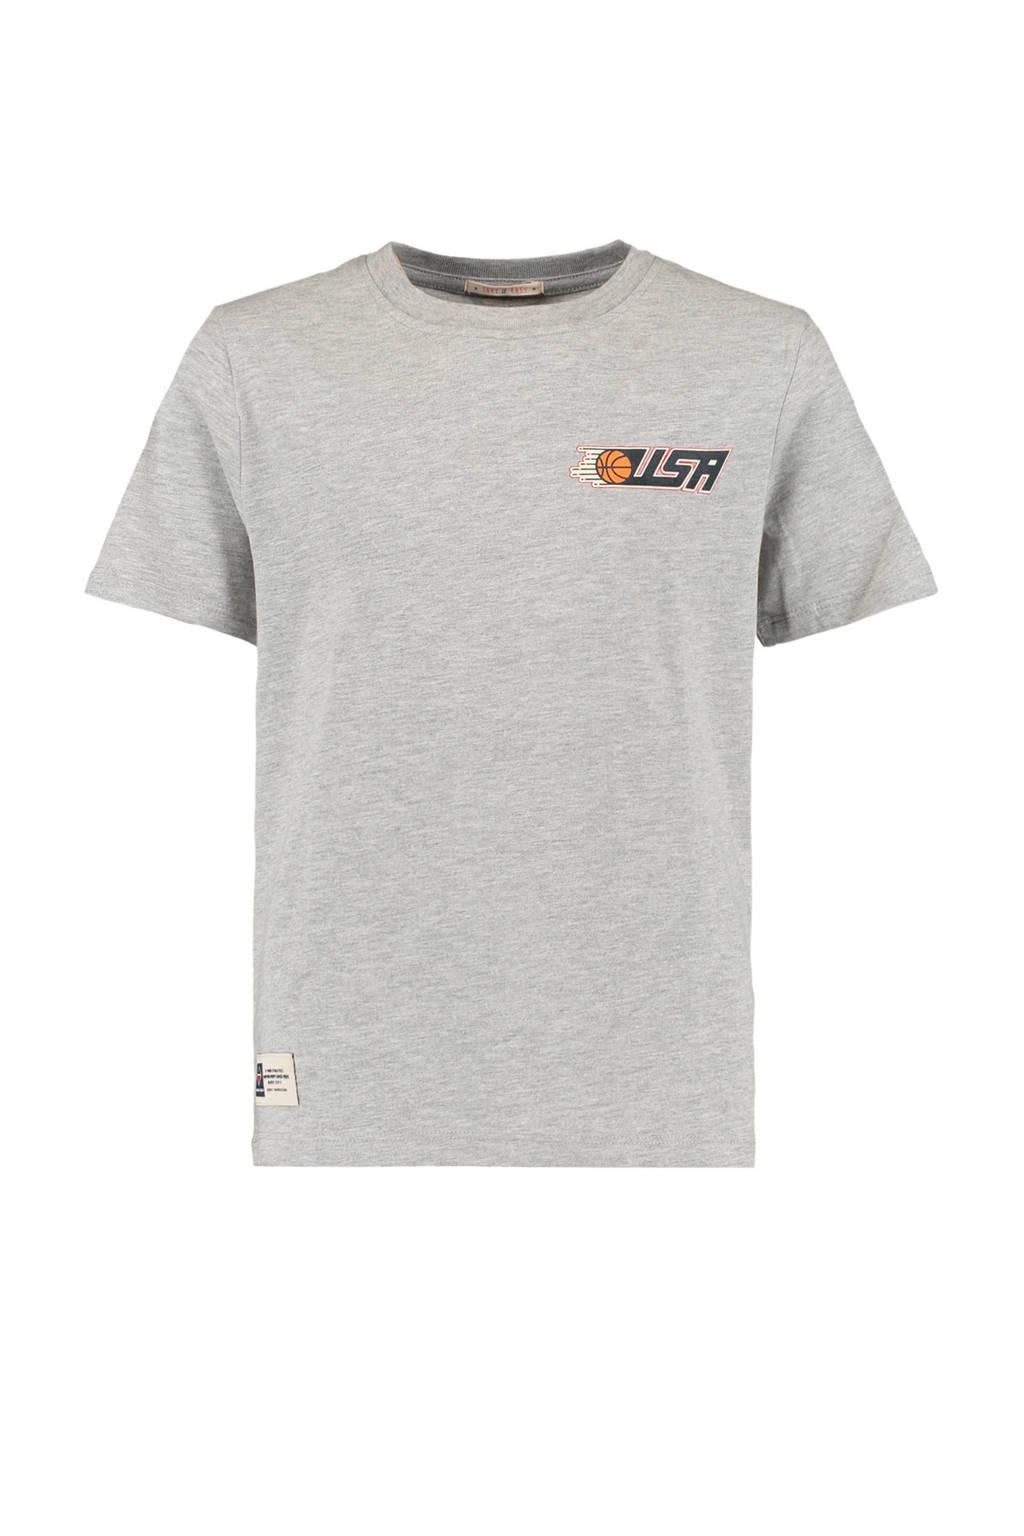 America Today Junior T-shirt Elvin met printopdruk lichtgrijs melange, Lichtgrijs melange